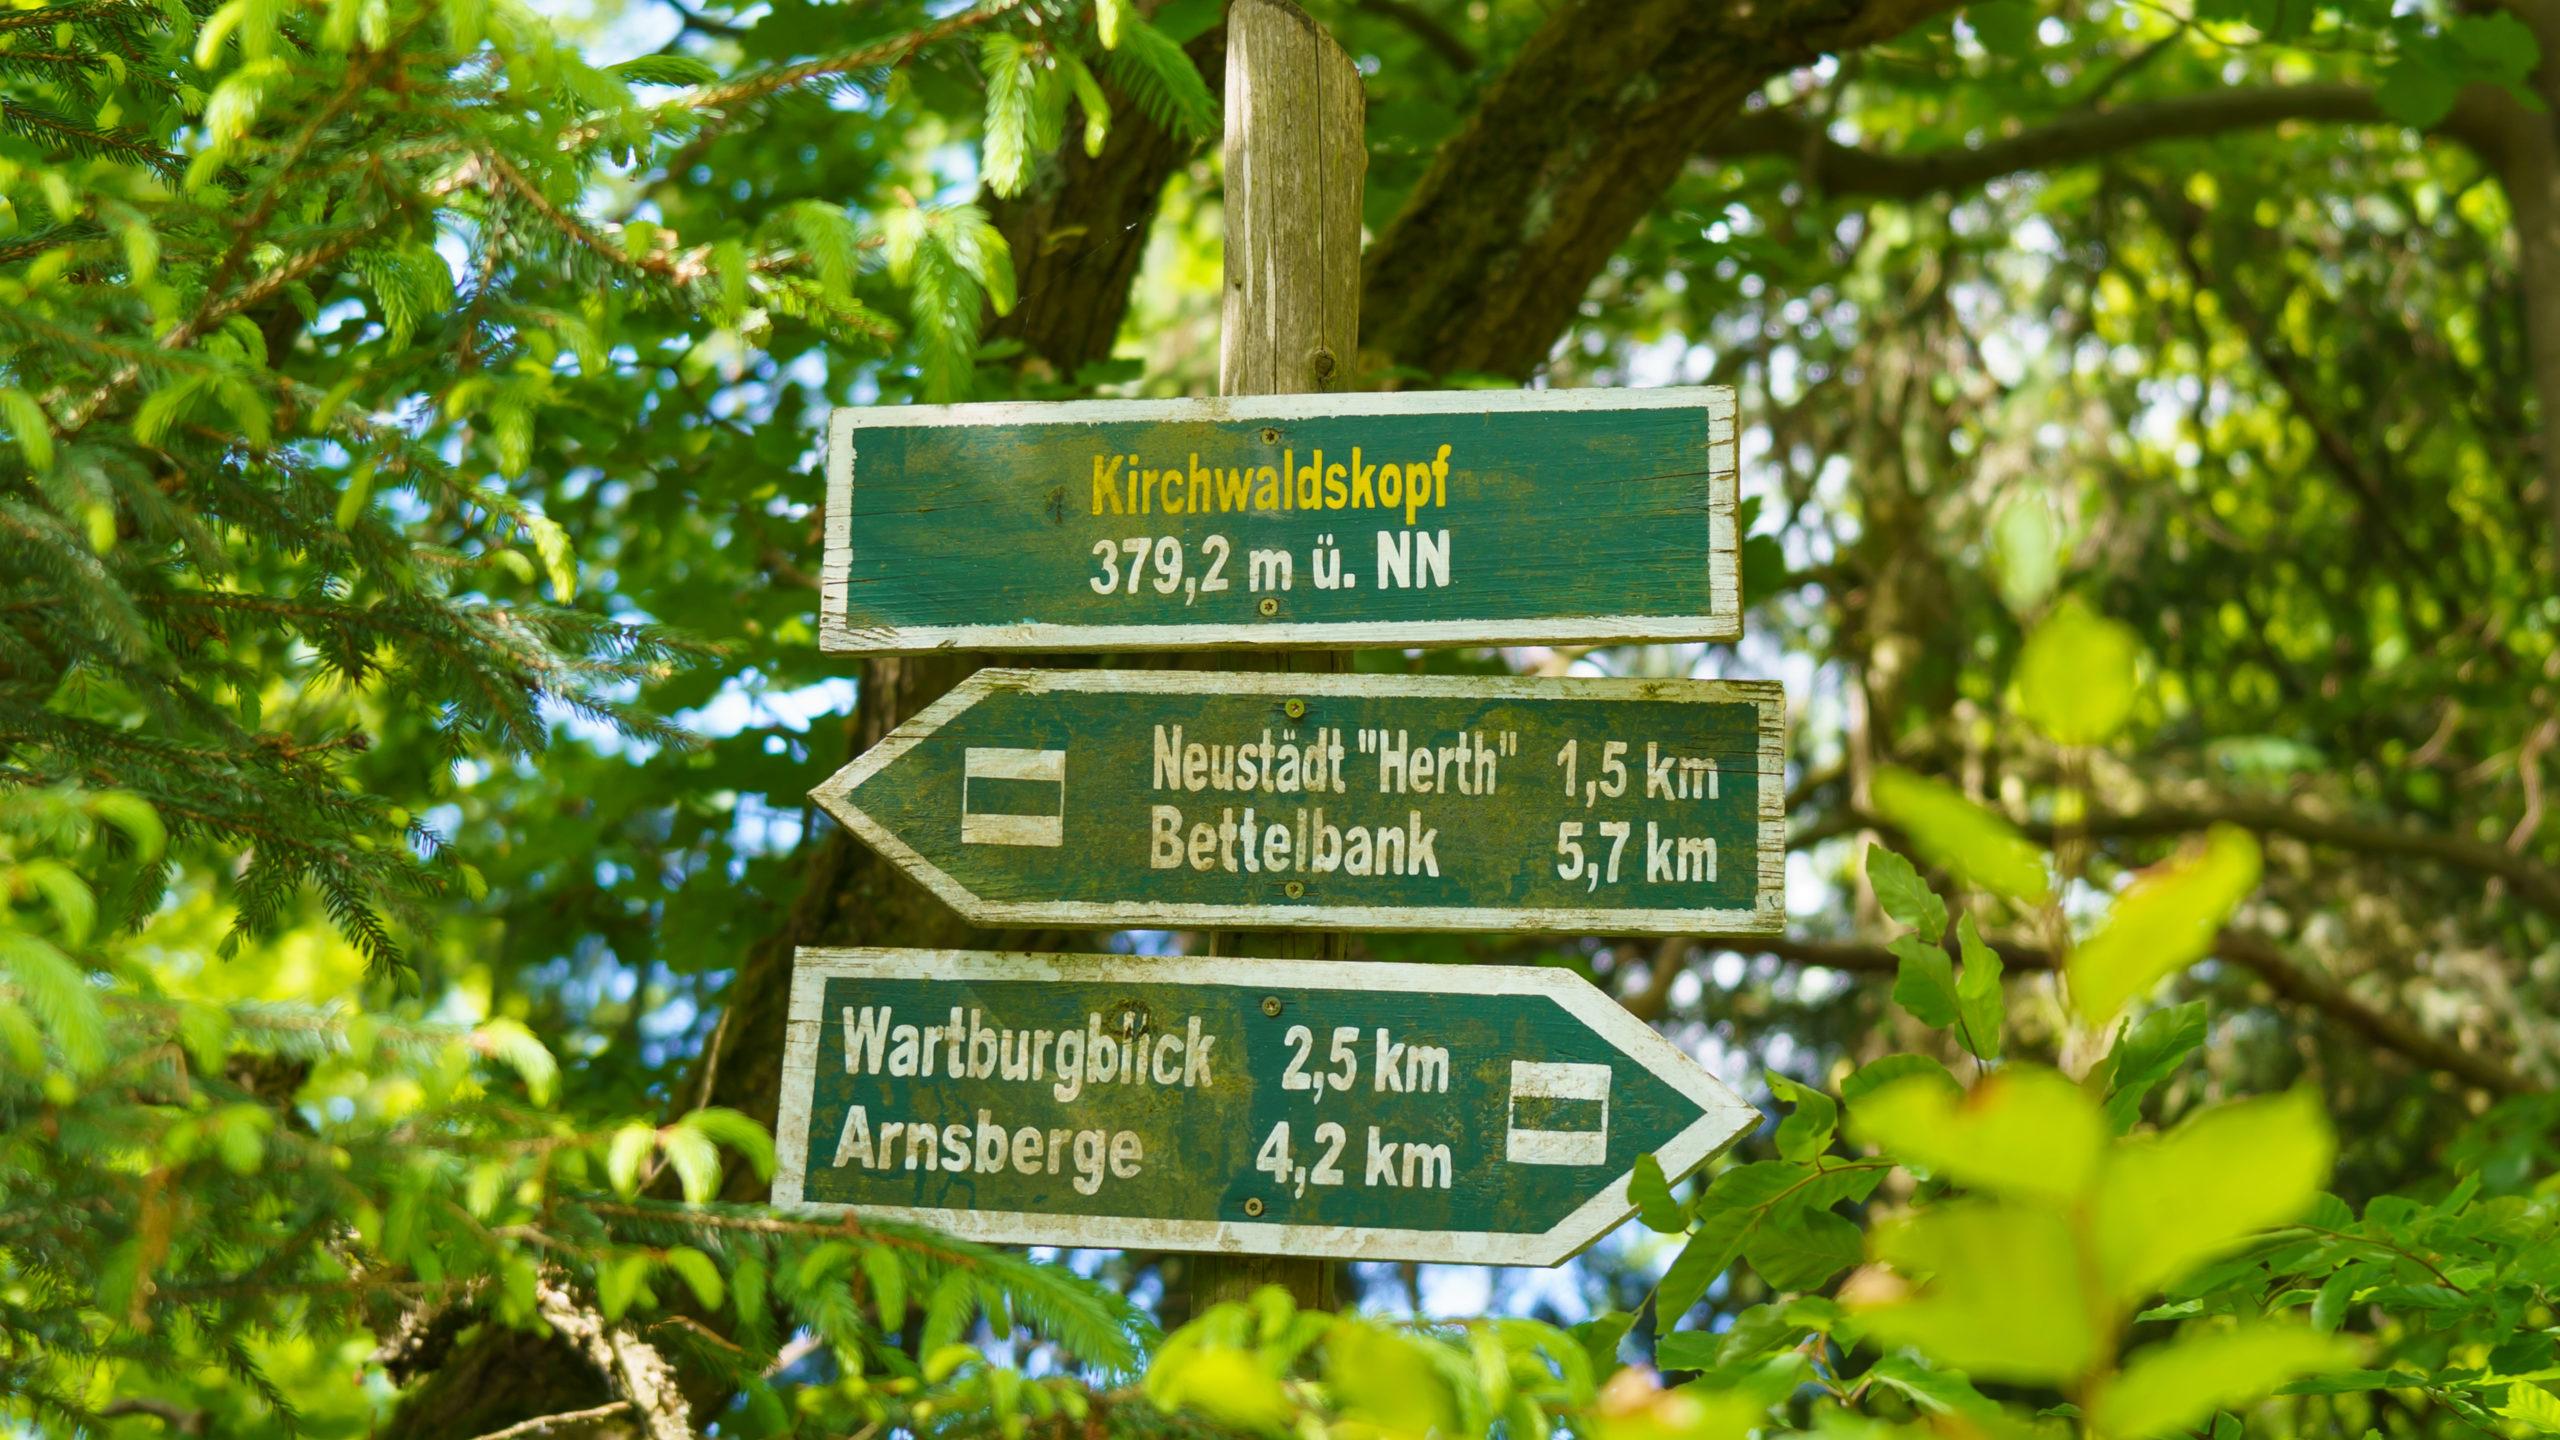 Grenzweg Gerstunger Forst, Wegweiser am Kirchwaldskopf